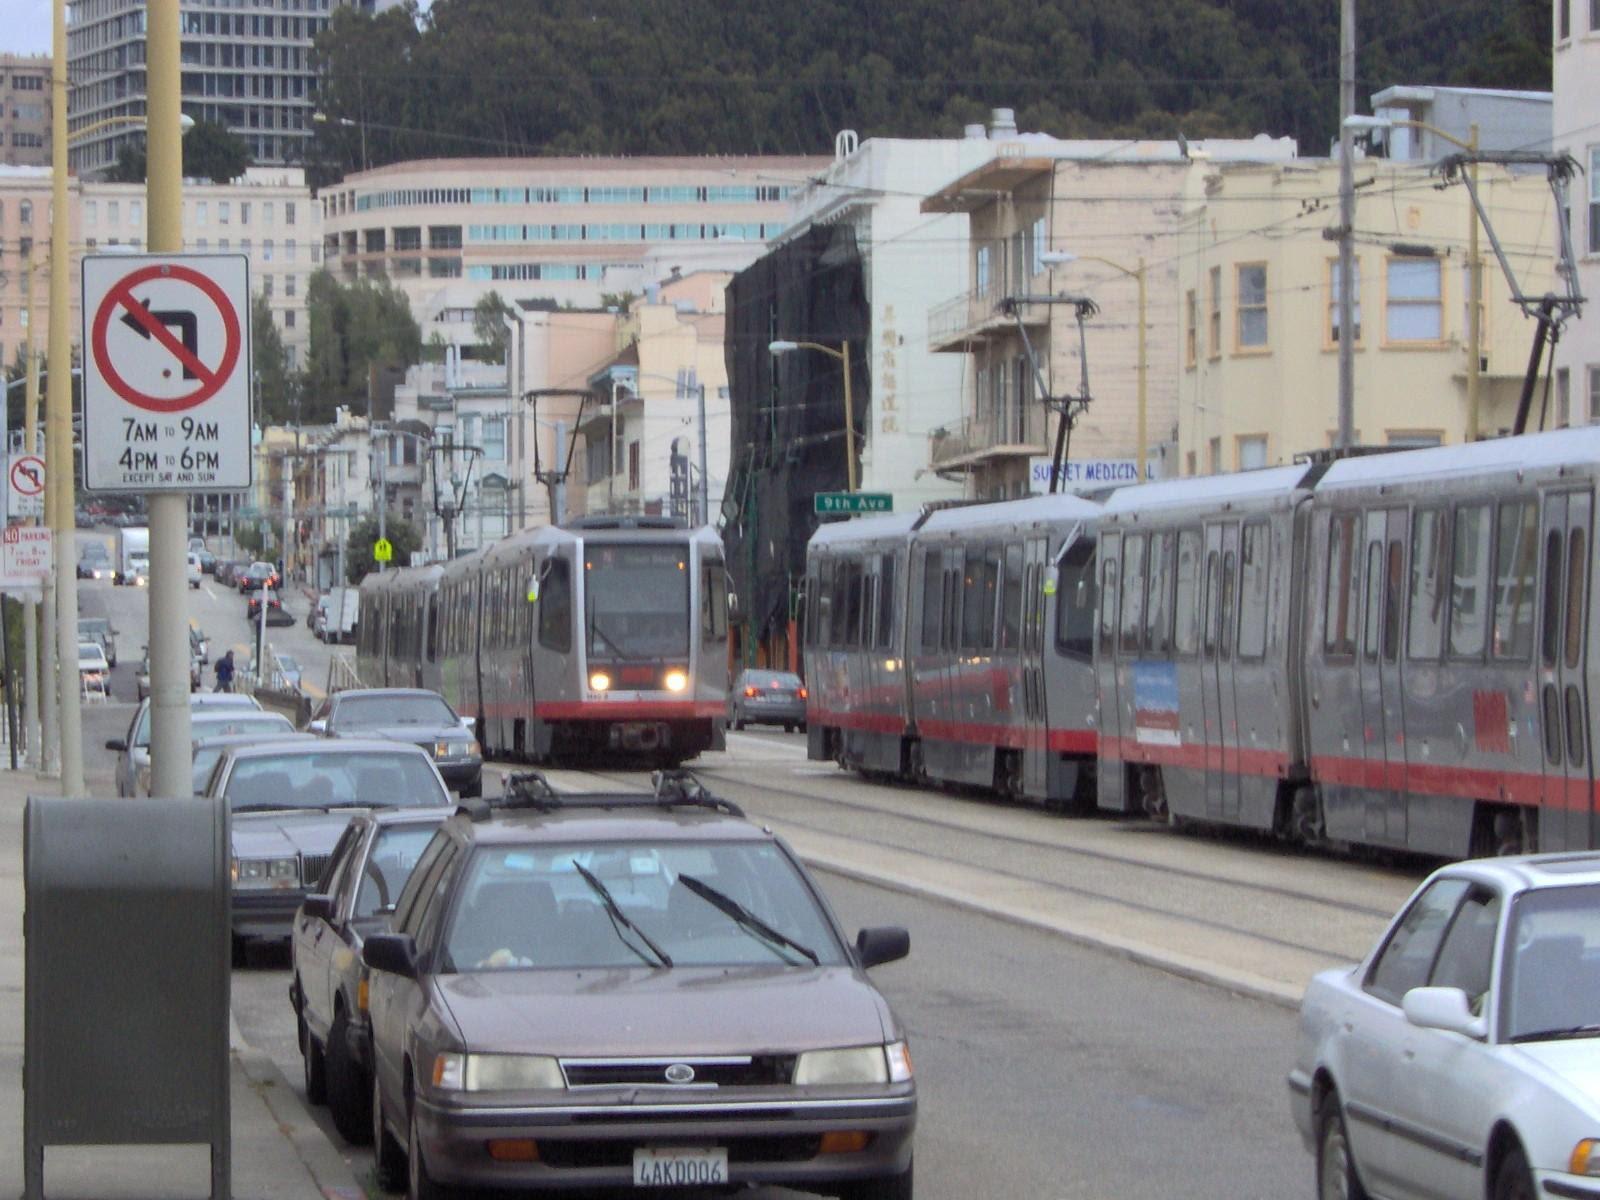 http://upload.wikimedia.org/wikipedia/commons/a/a6/San_Francisco-N_Judah.jpg